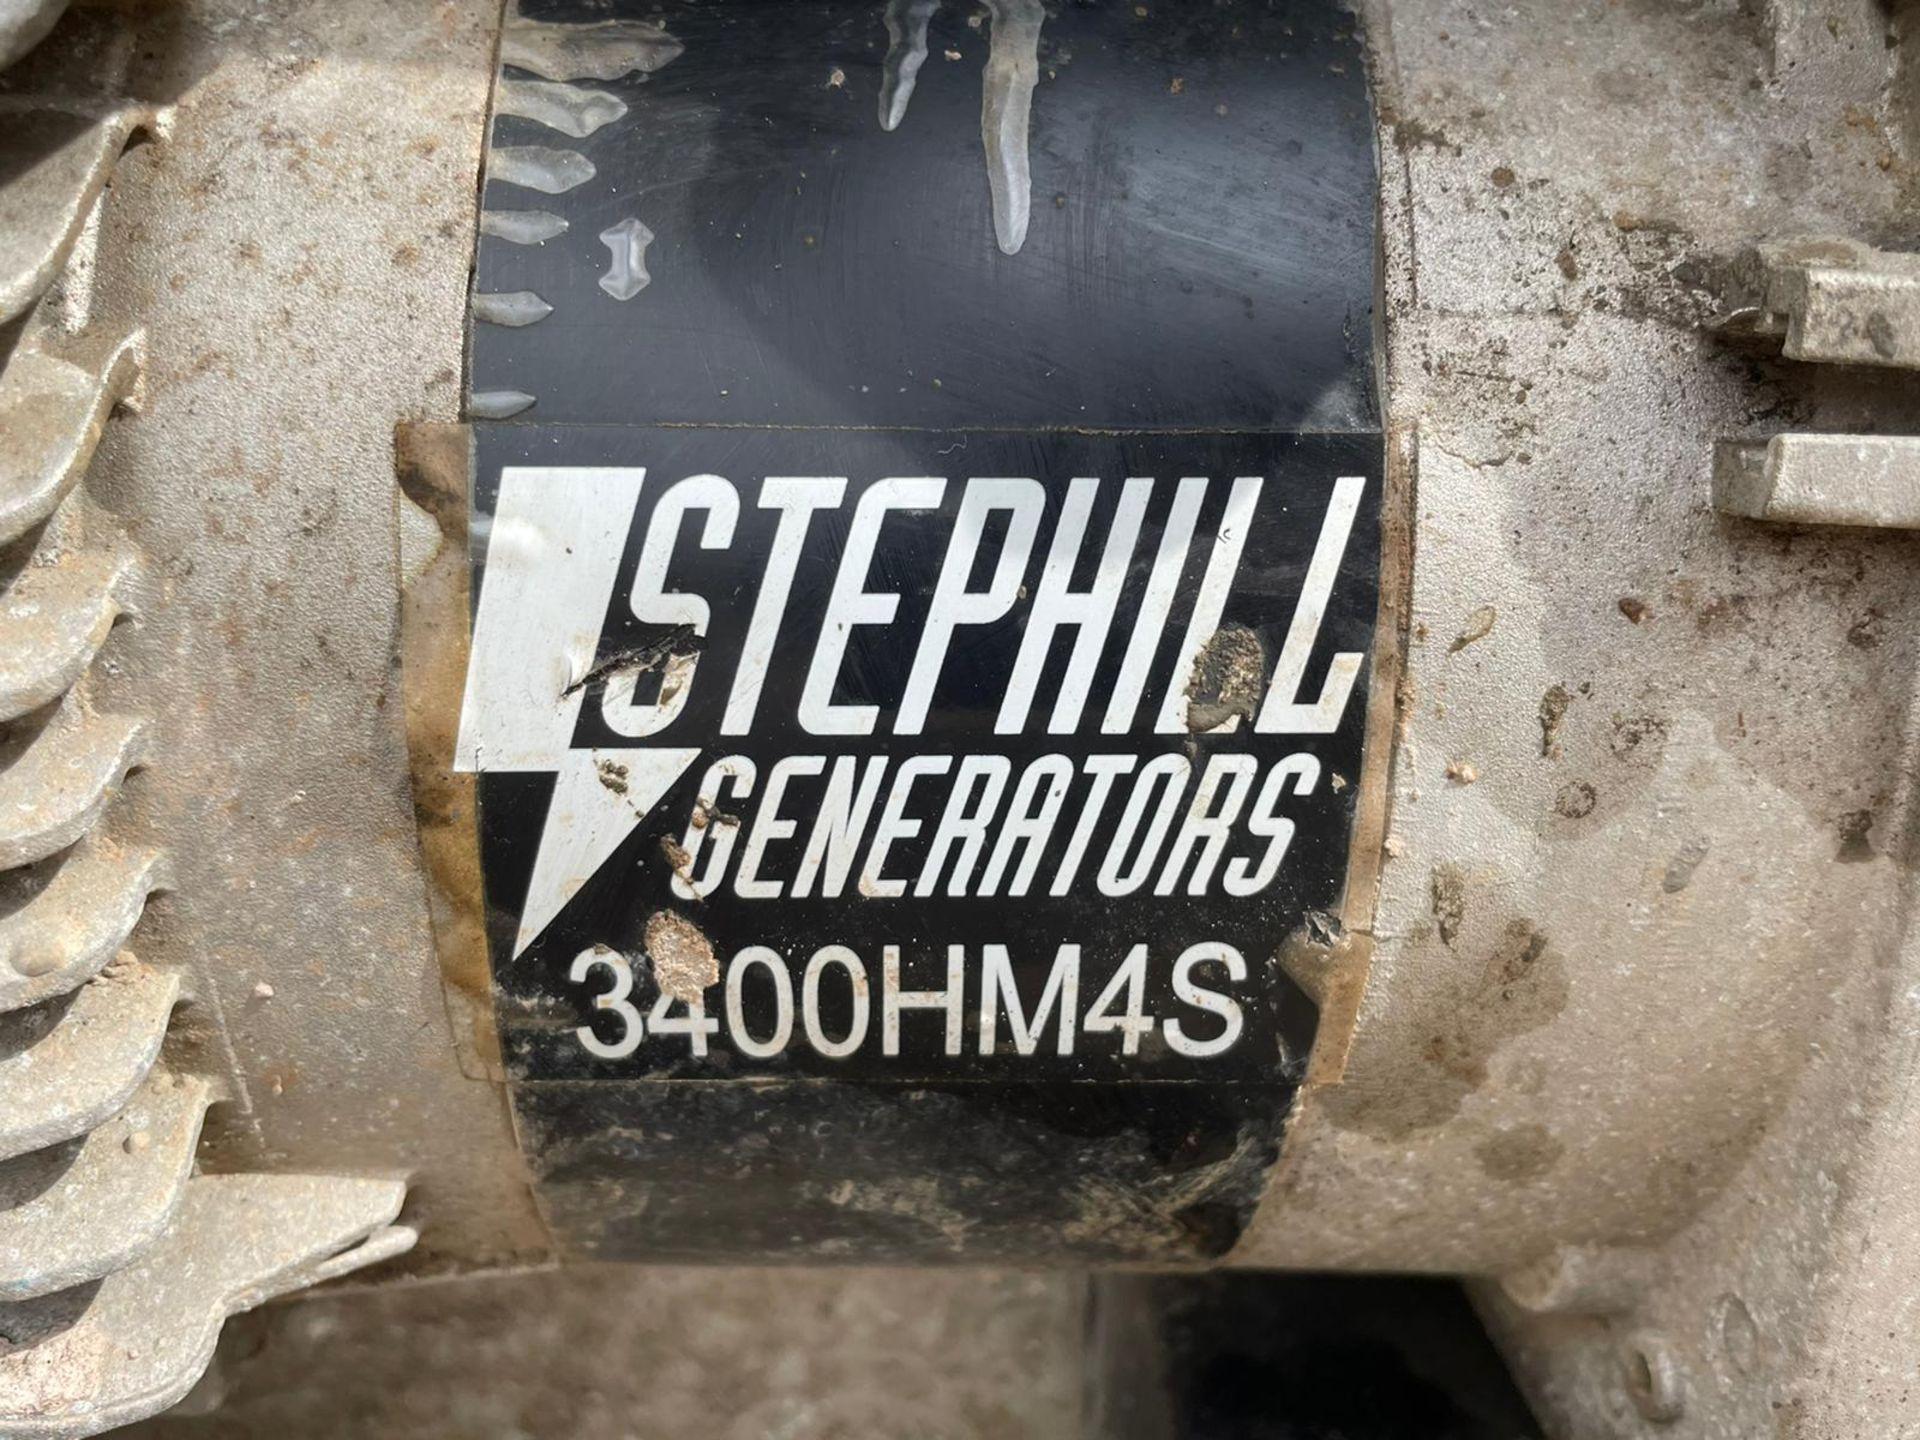 2015 STEPHILL 3400HM4S GENERATOR 3.4KVA, 115 AND 230 VOLTS, HONDA PETROL ENGINE, RUNS *NO VAT* - Image 4 of 4